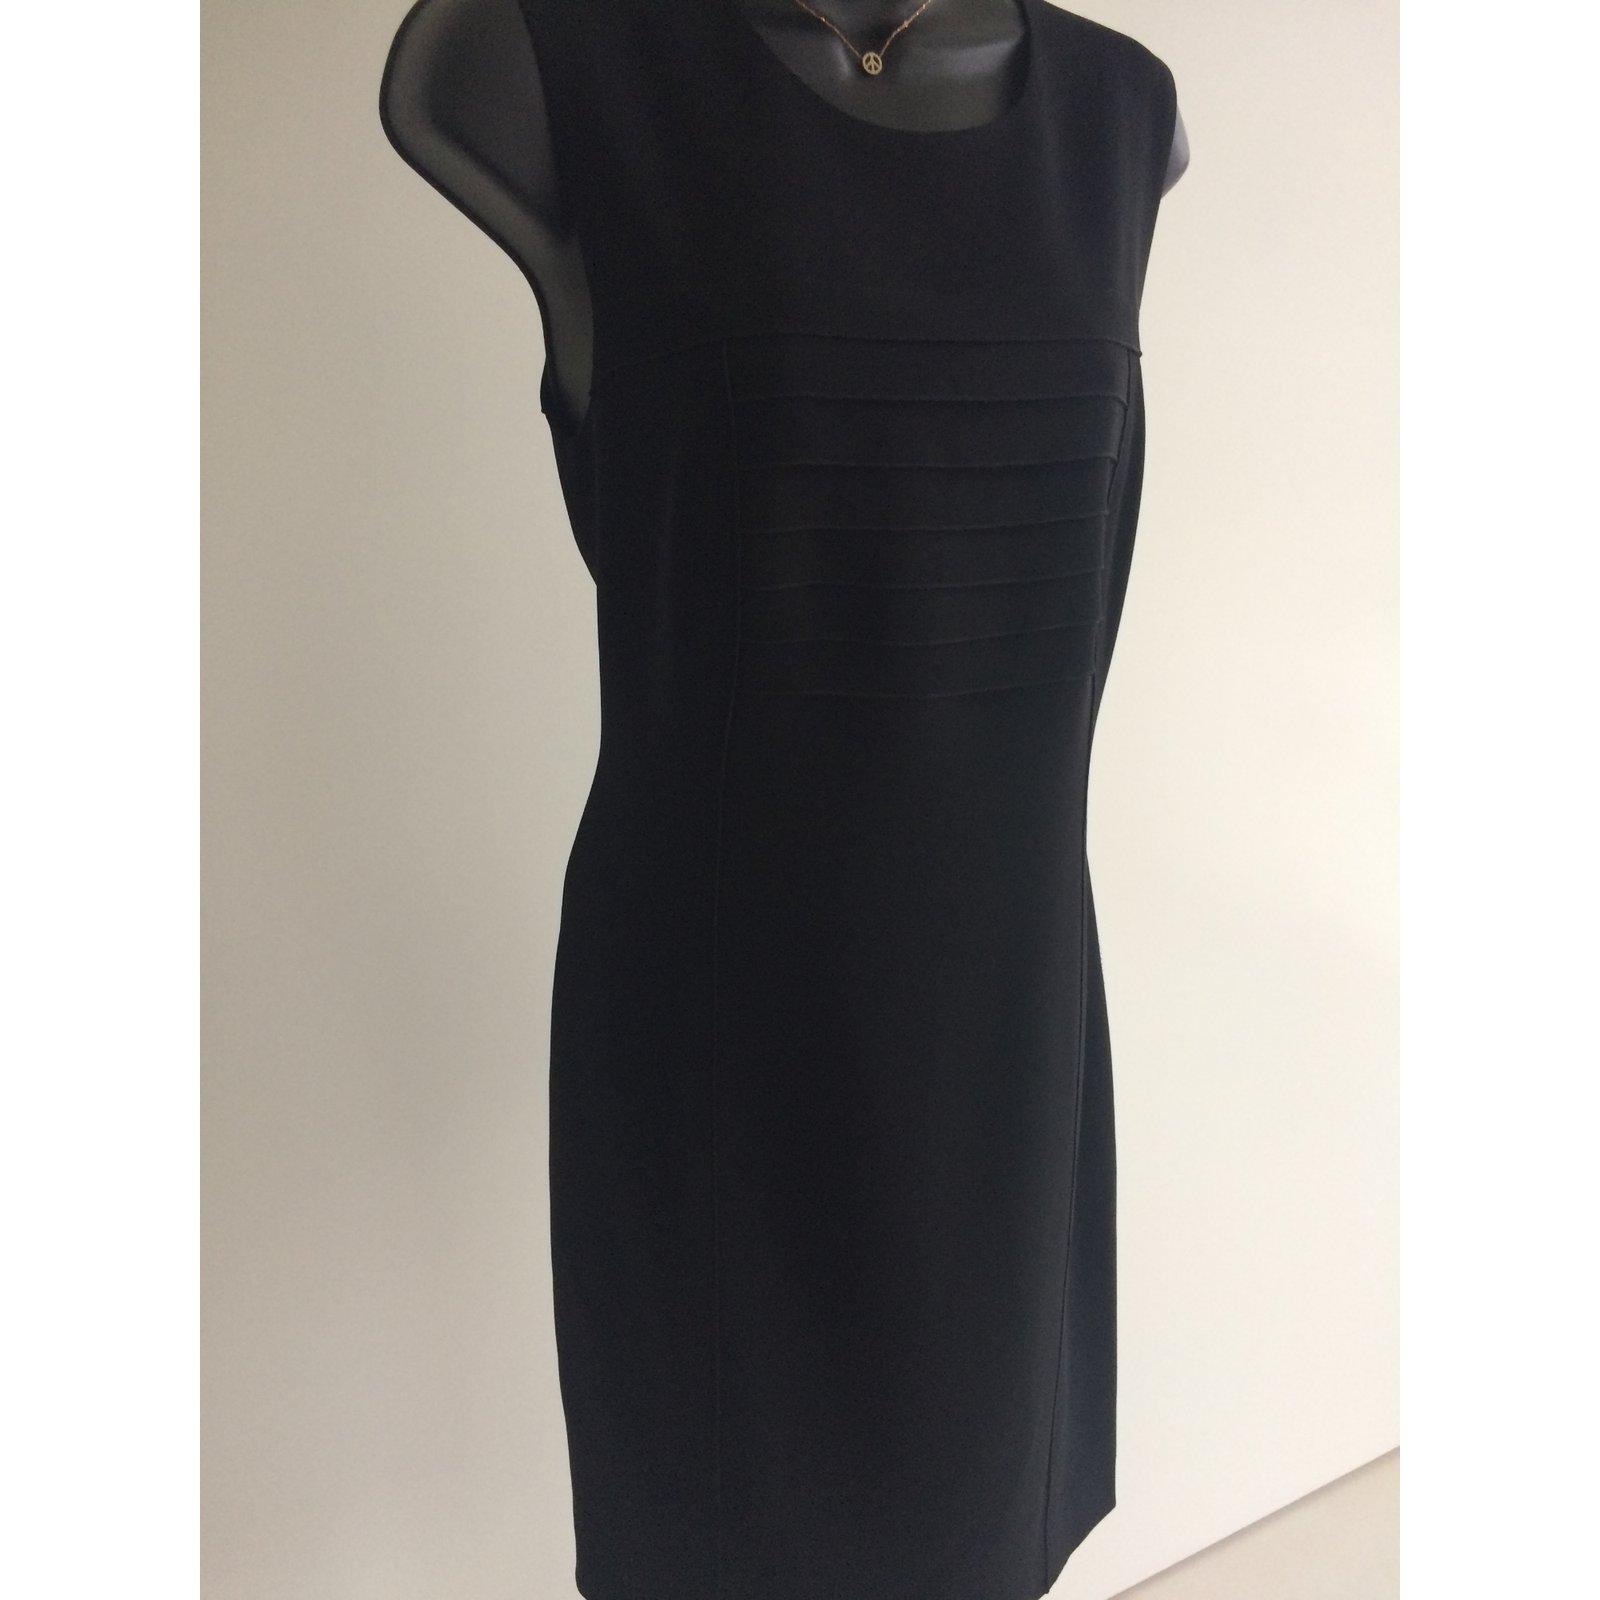 60fcd456426 Max Mara Dresses Dresses Other Black ref.52343 - Joli Closet